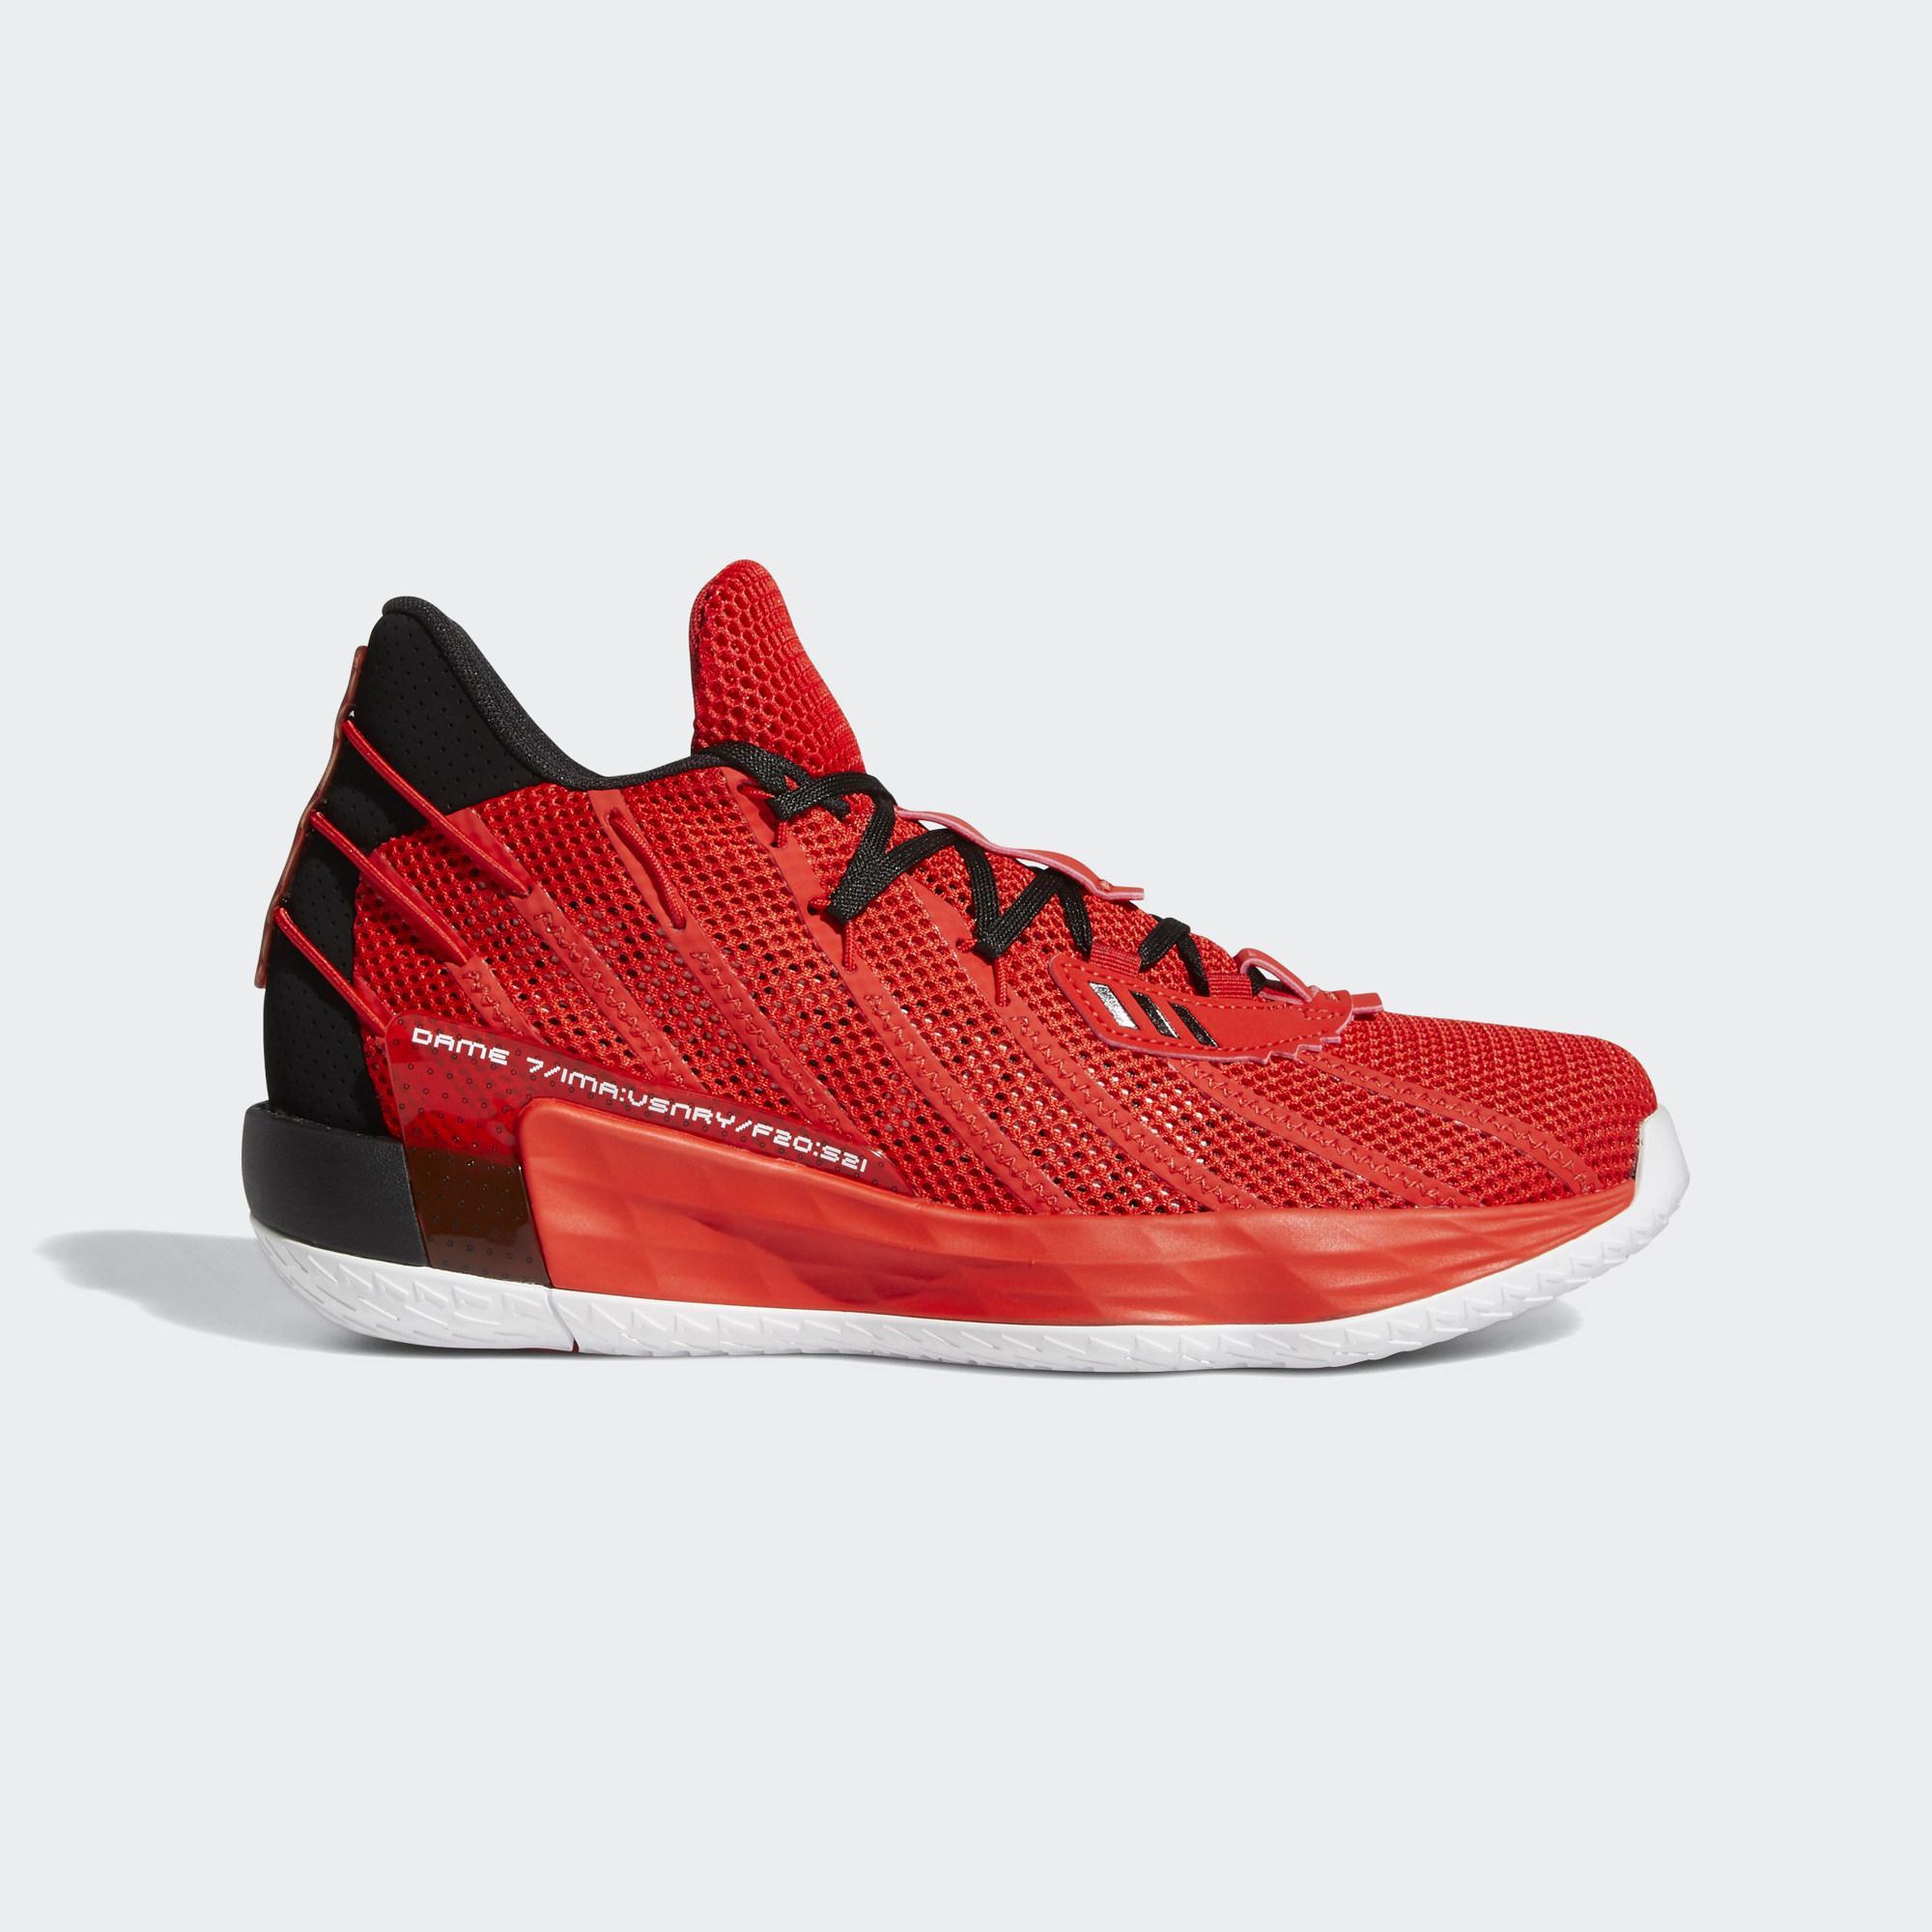 Dame 7 籃球鞋